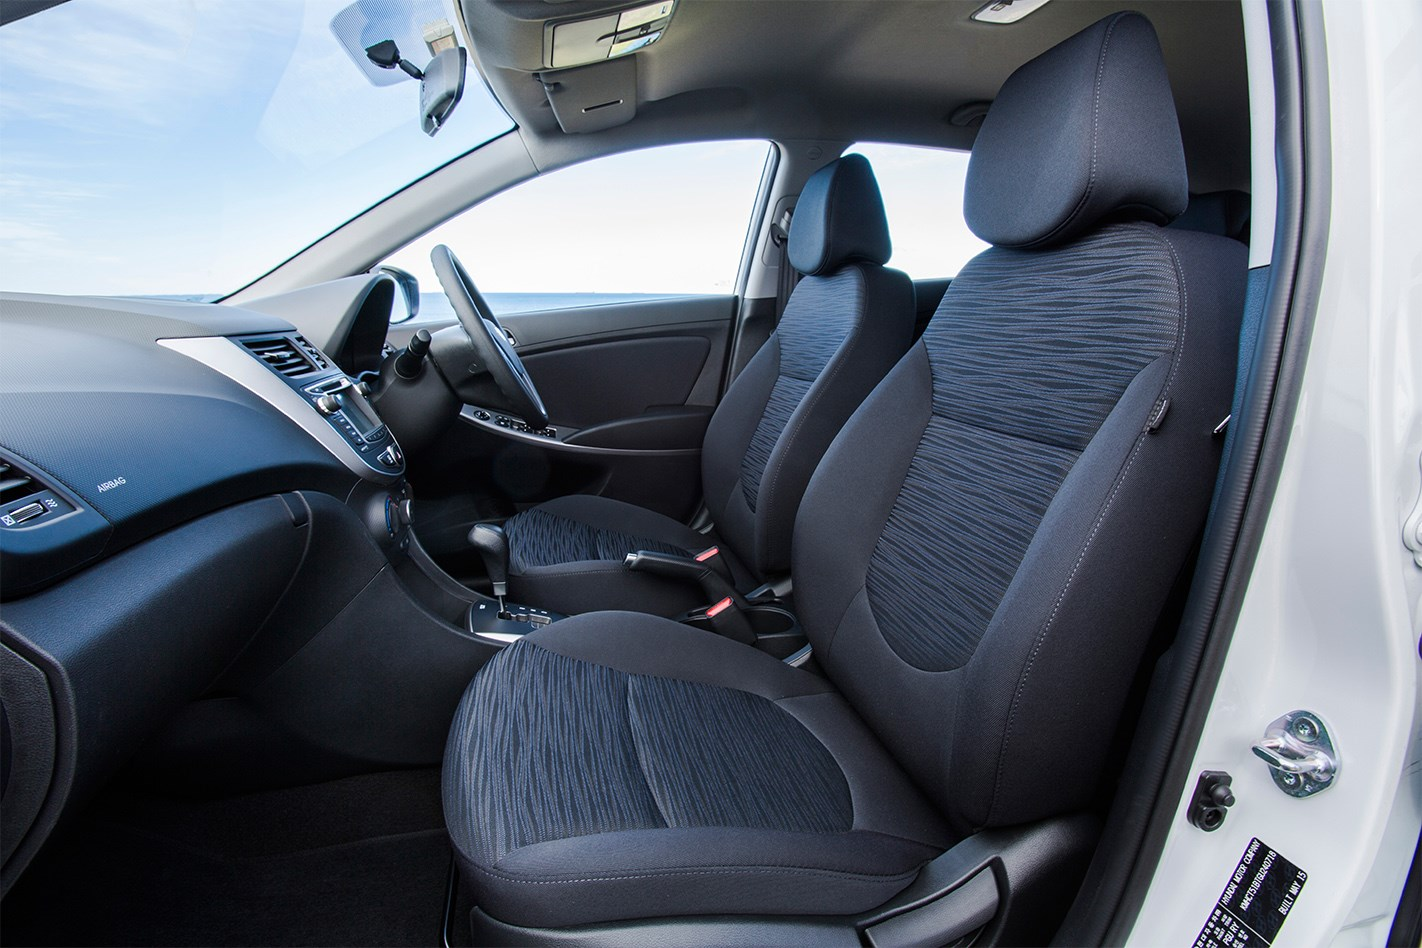 hyundai accent car seat covers australia velcromag. Black Bedroom Furniture Sets. Home Design Ideas